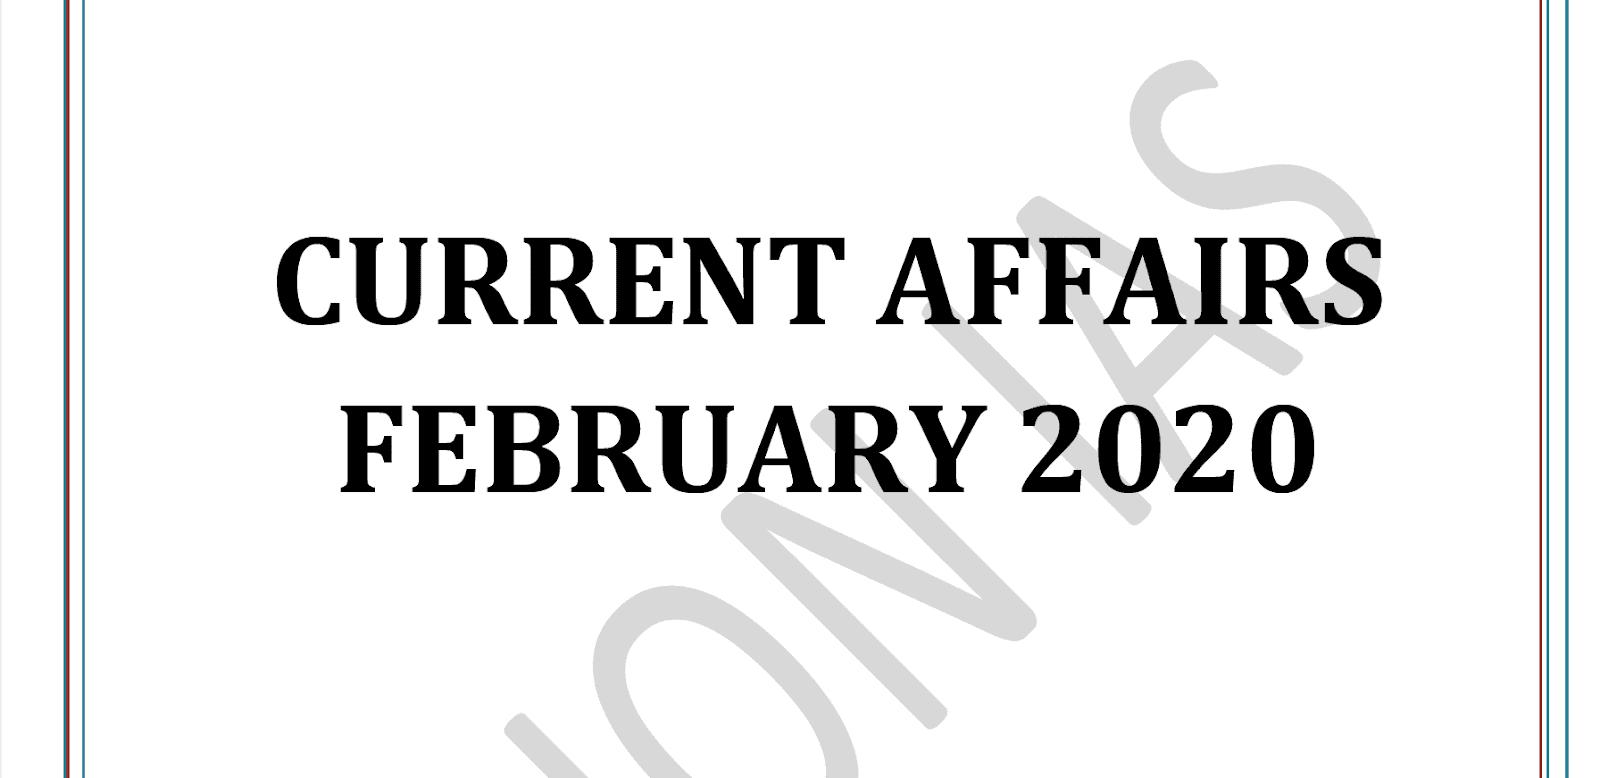 Vision IAS Current Affairs February 2020 pdf